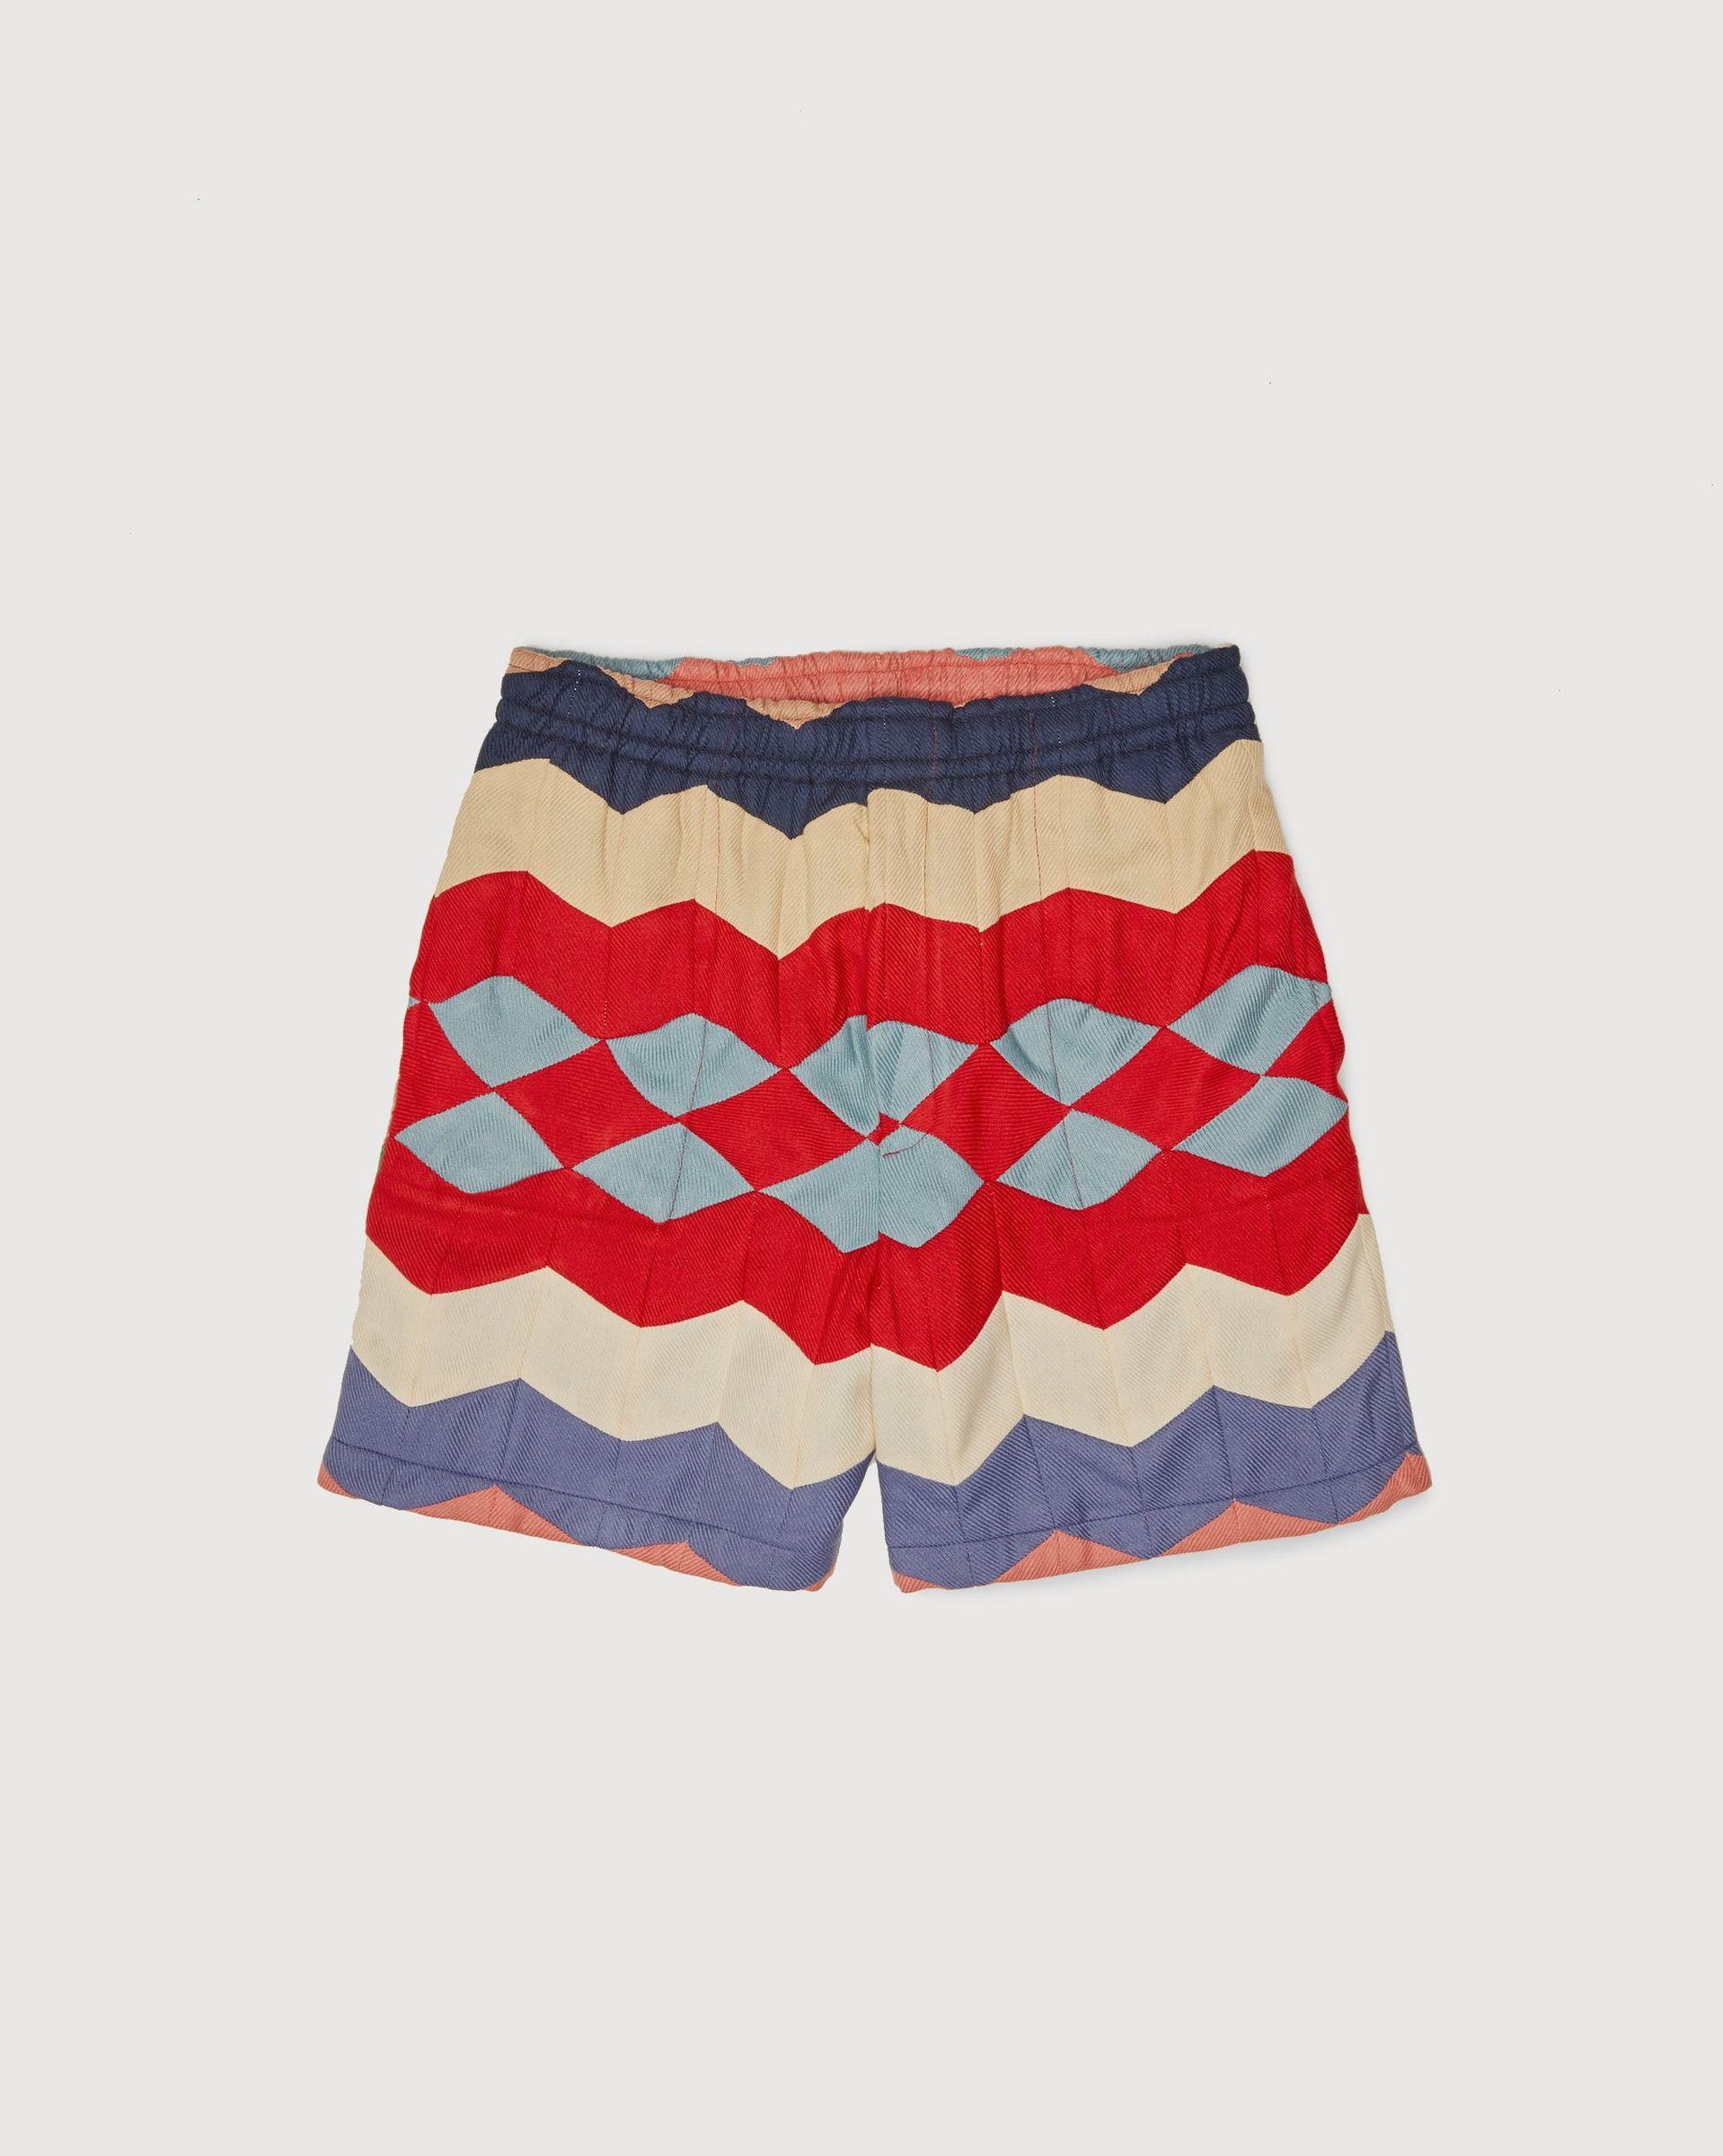 BODE - Chevron Quilt Shorts Multi - Image 1